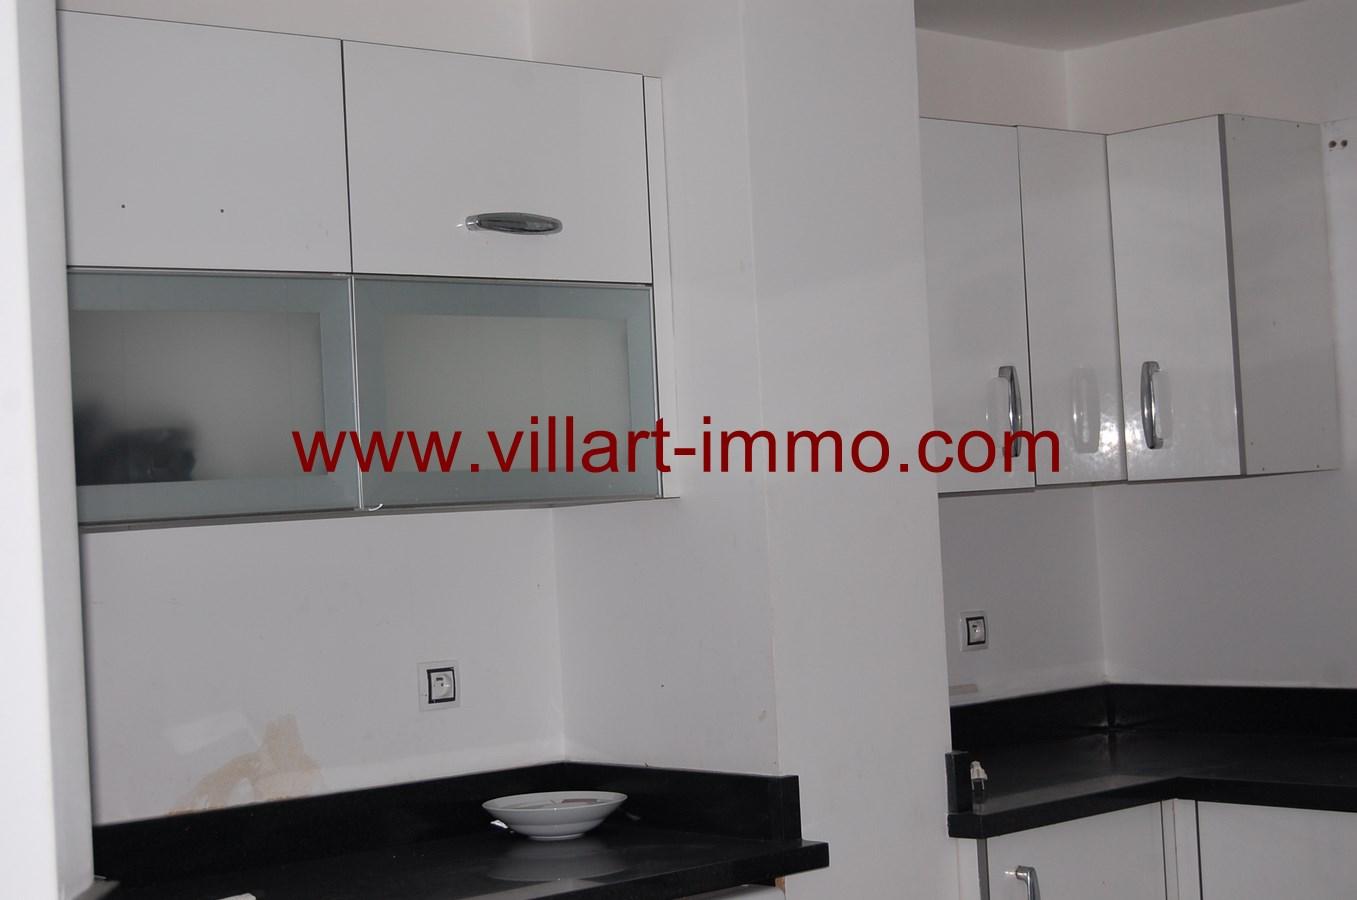 4-a-vendre-appartement-tanger-quartier-playa-cuisine-2-va433-villart-immo